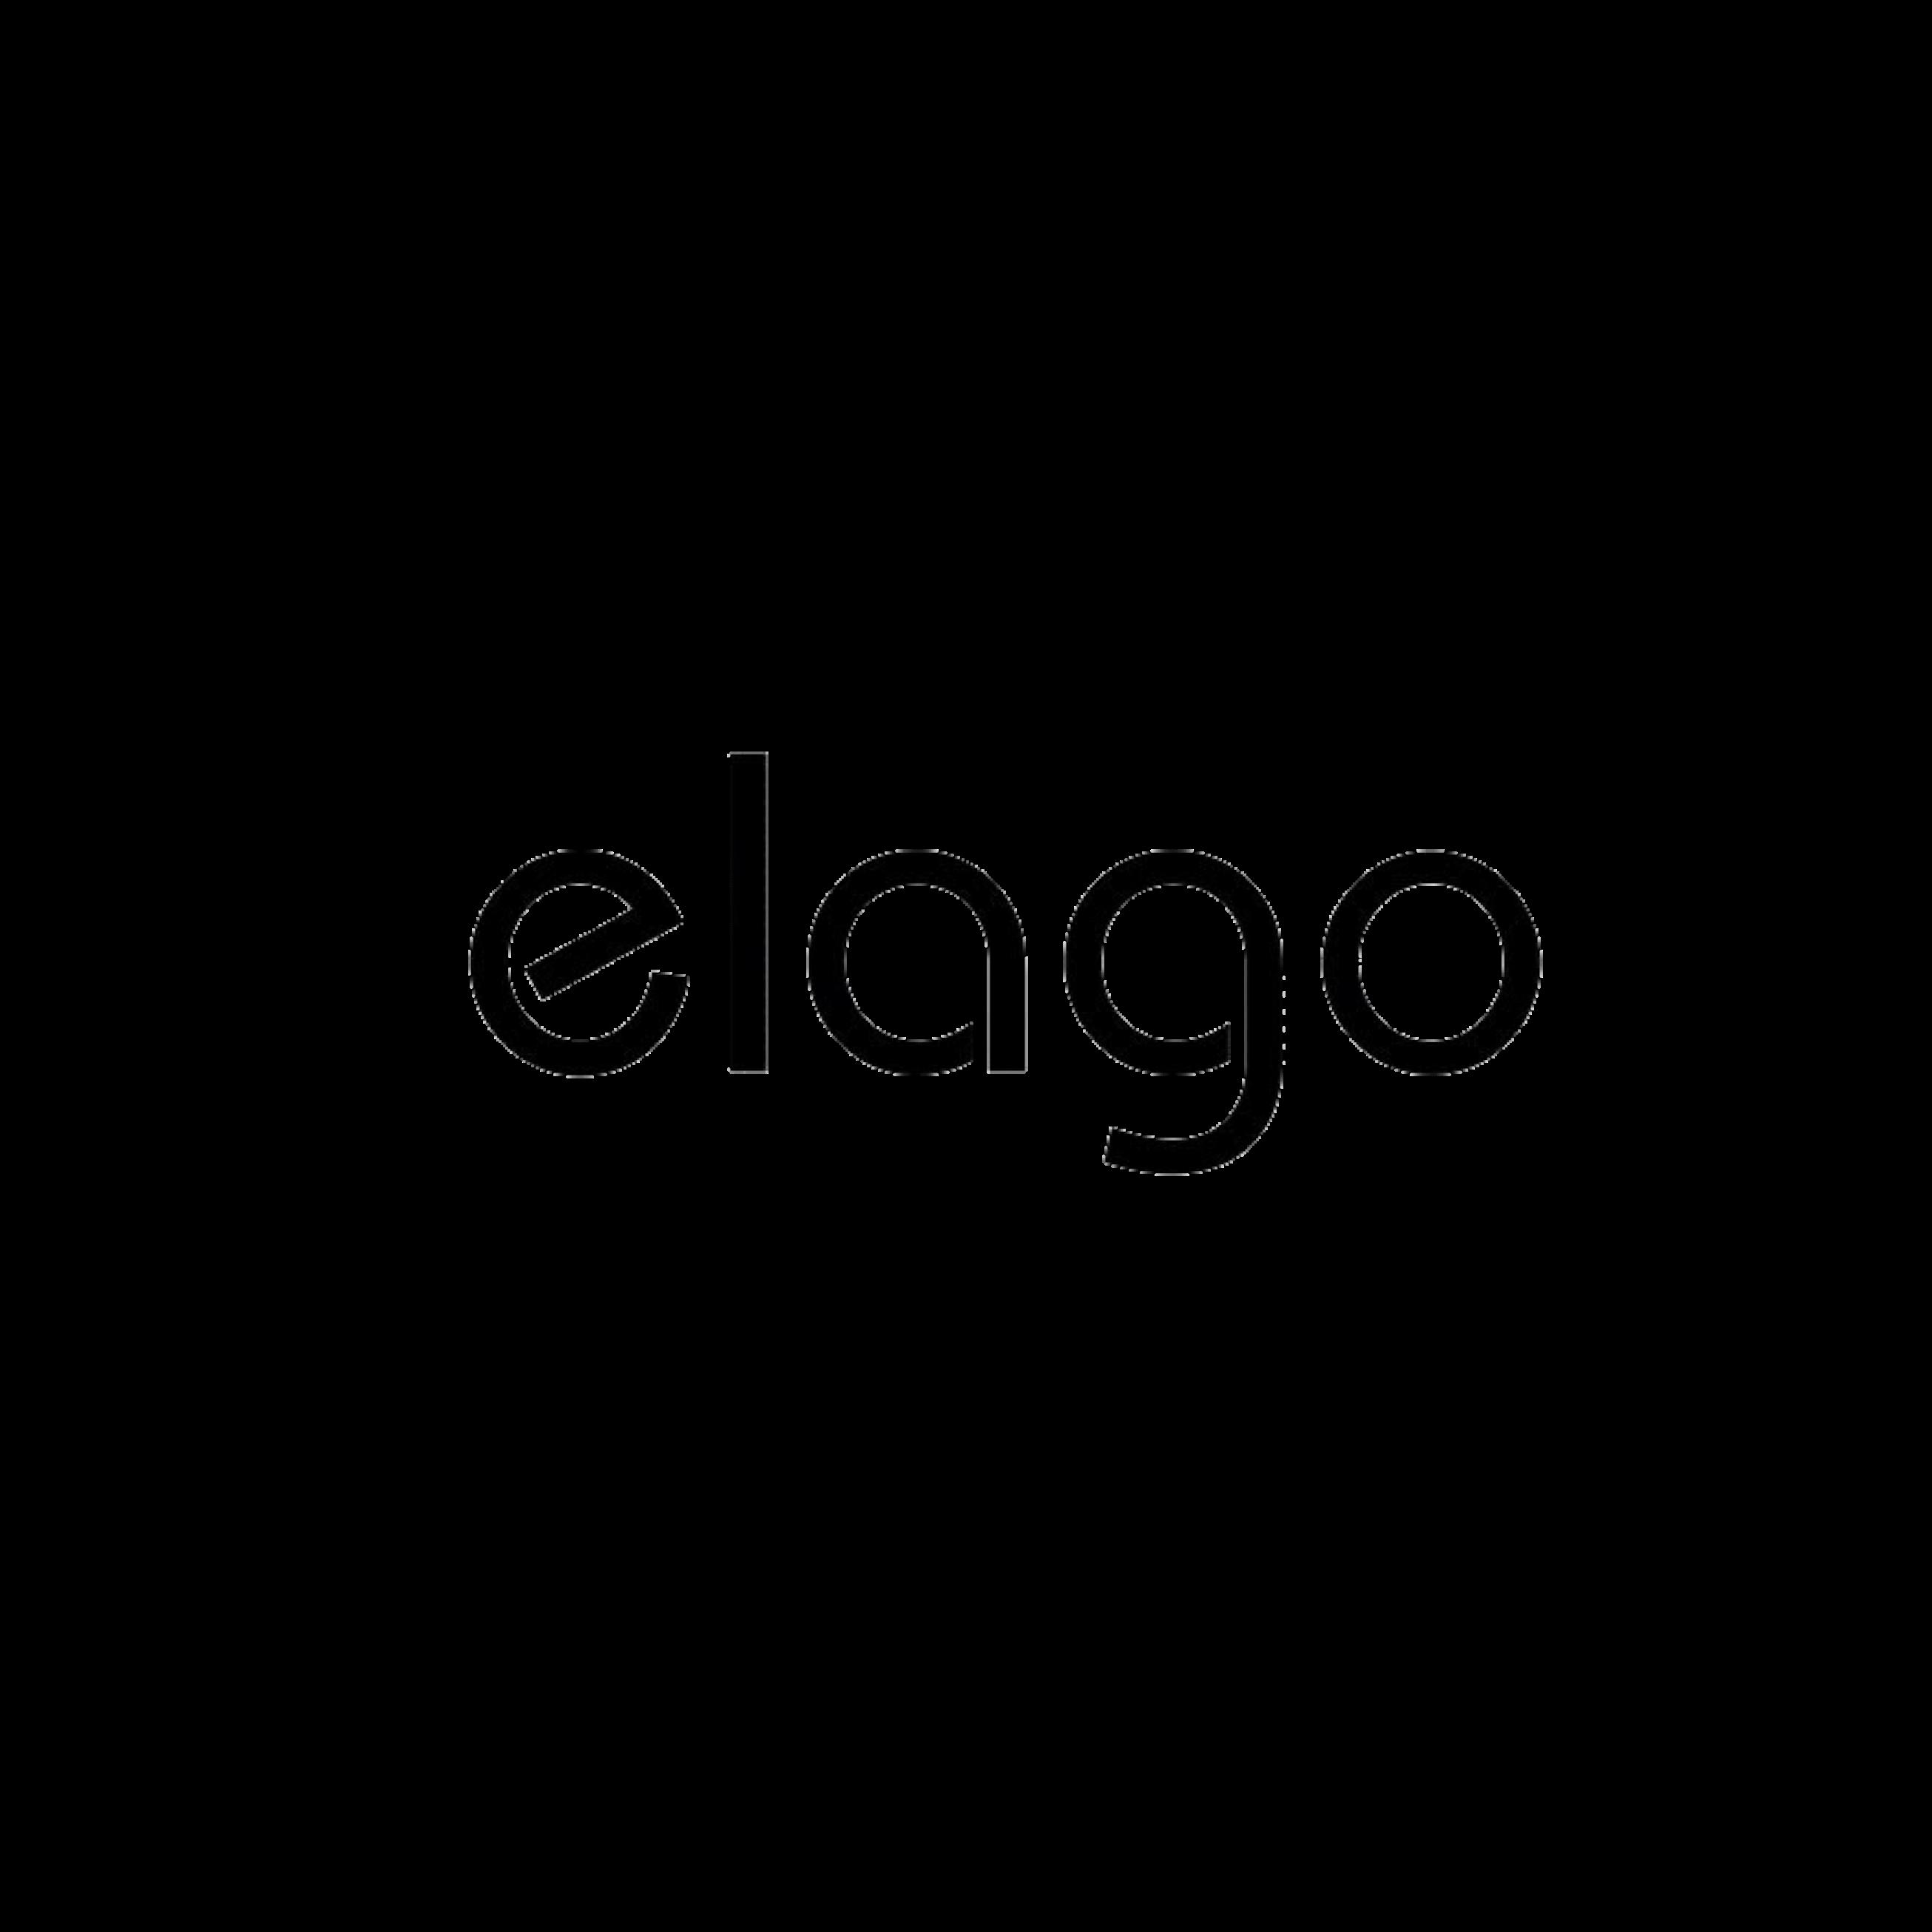 elago product's